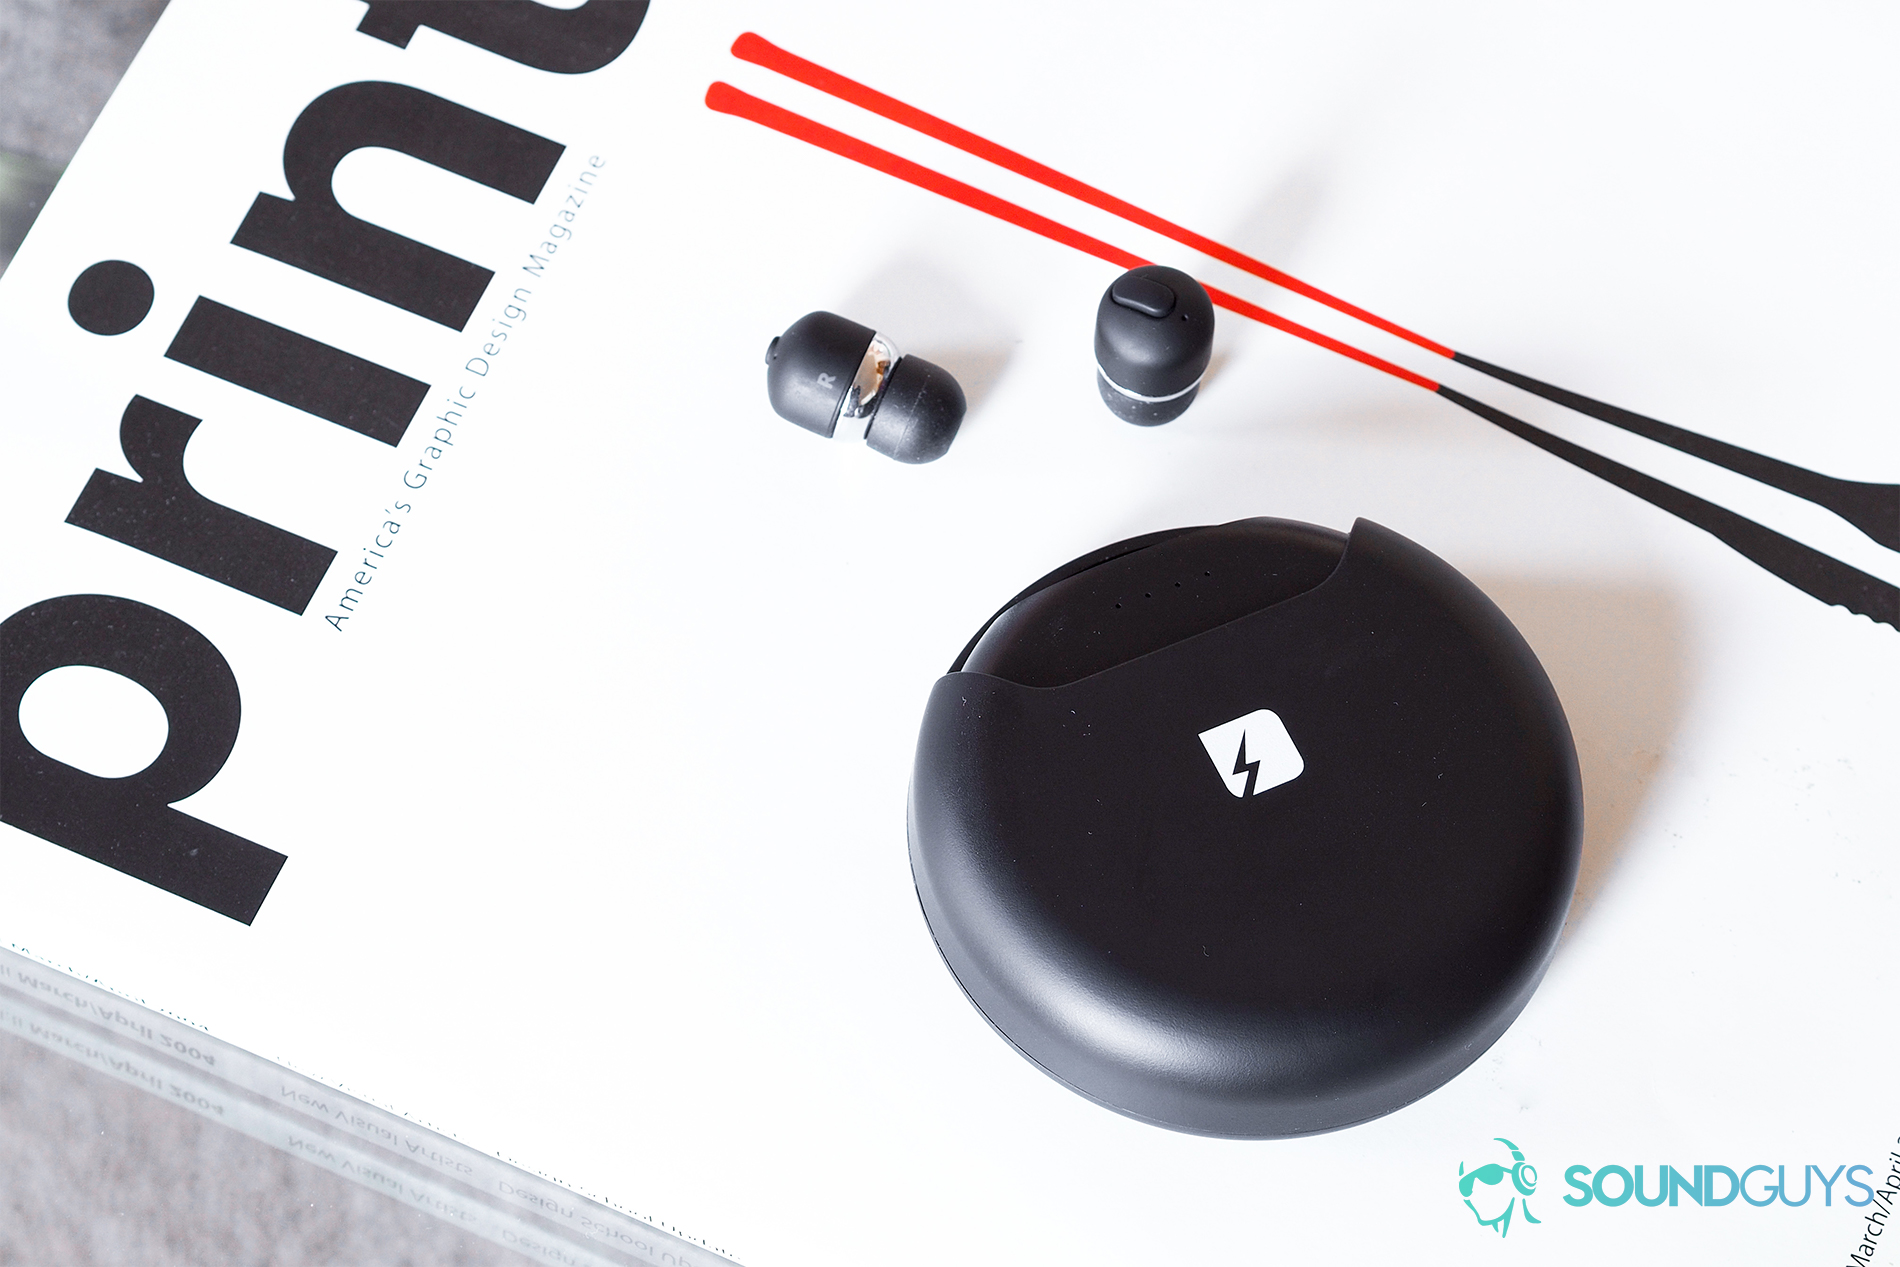 90294f58eed0f2 TRNDLabs Nova True Wireless Earbuds Review - SoundGuys